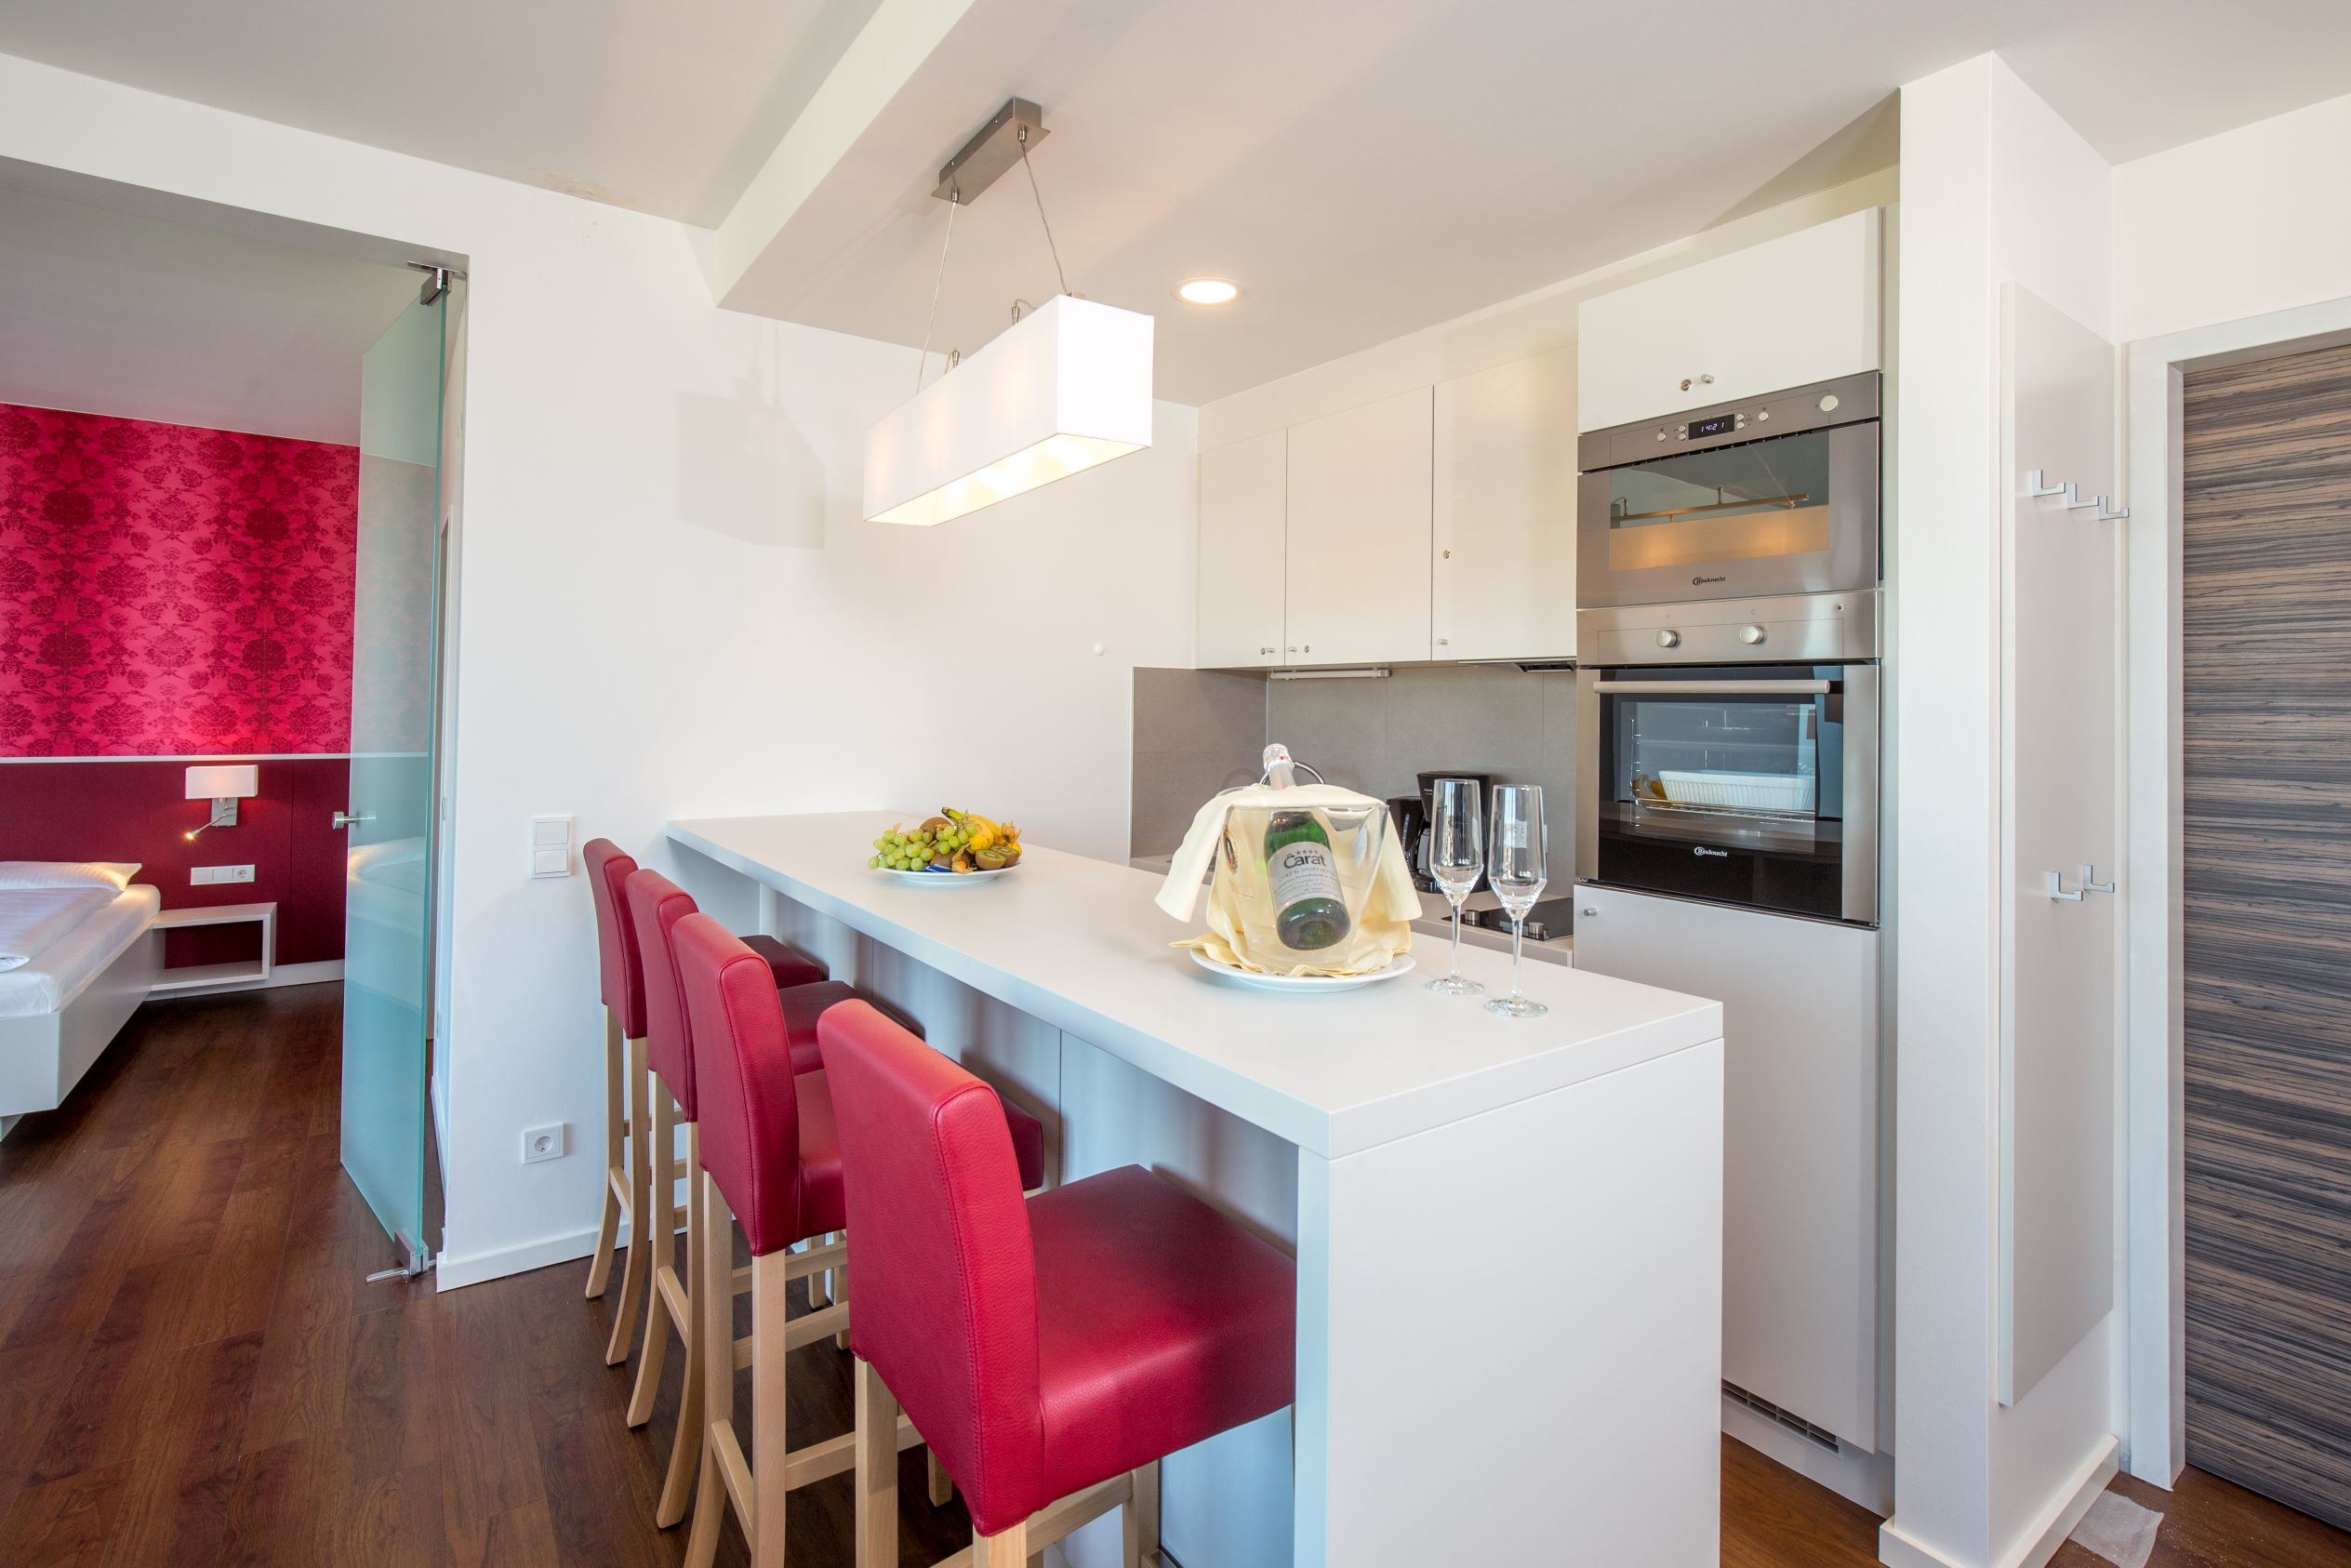 2-Zimmer-Apartments – Carat Residenz